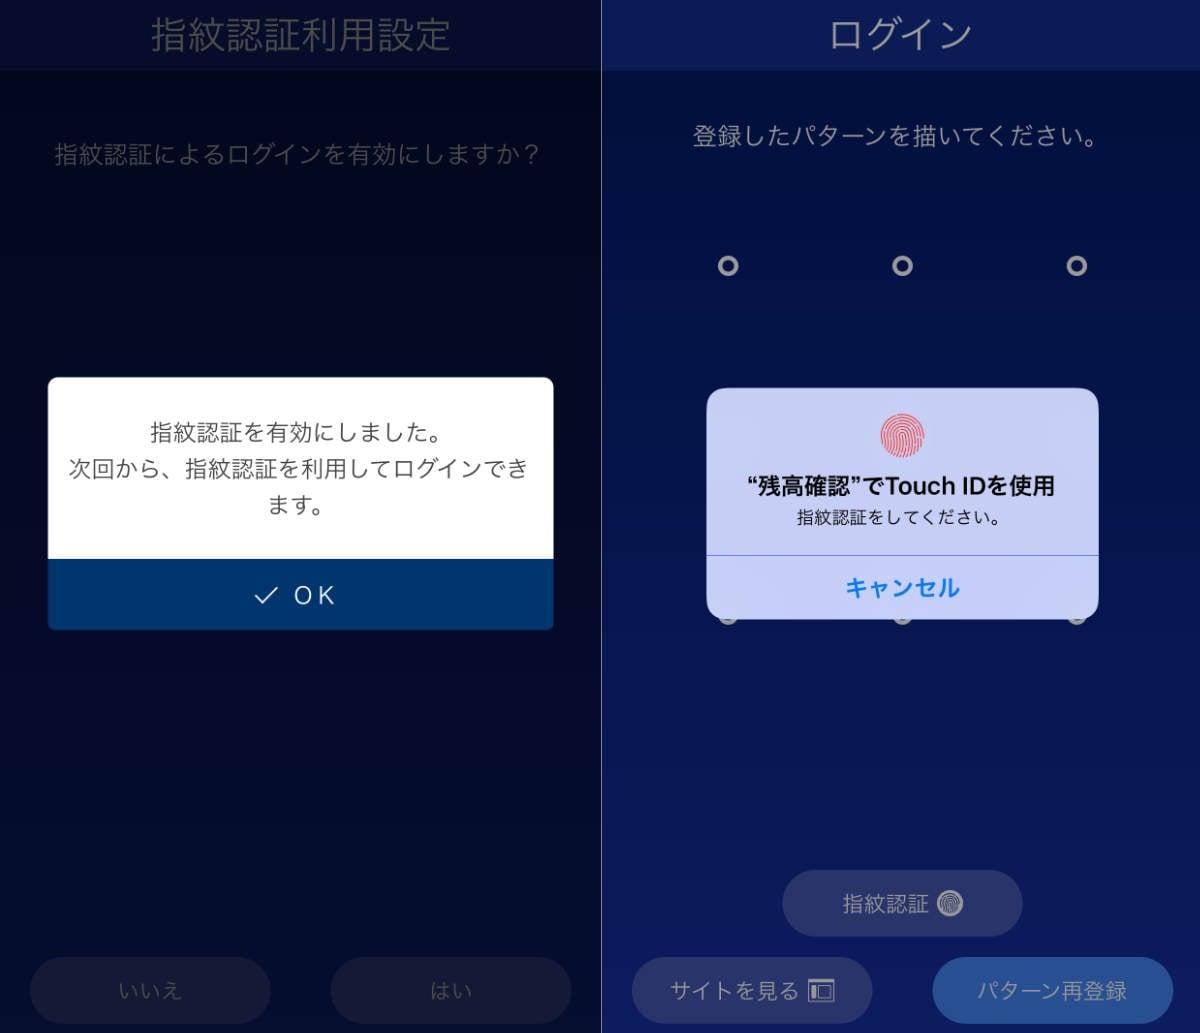 Jnb app touchID